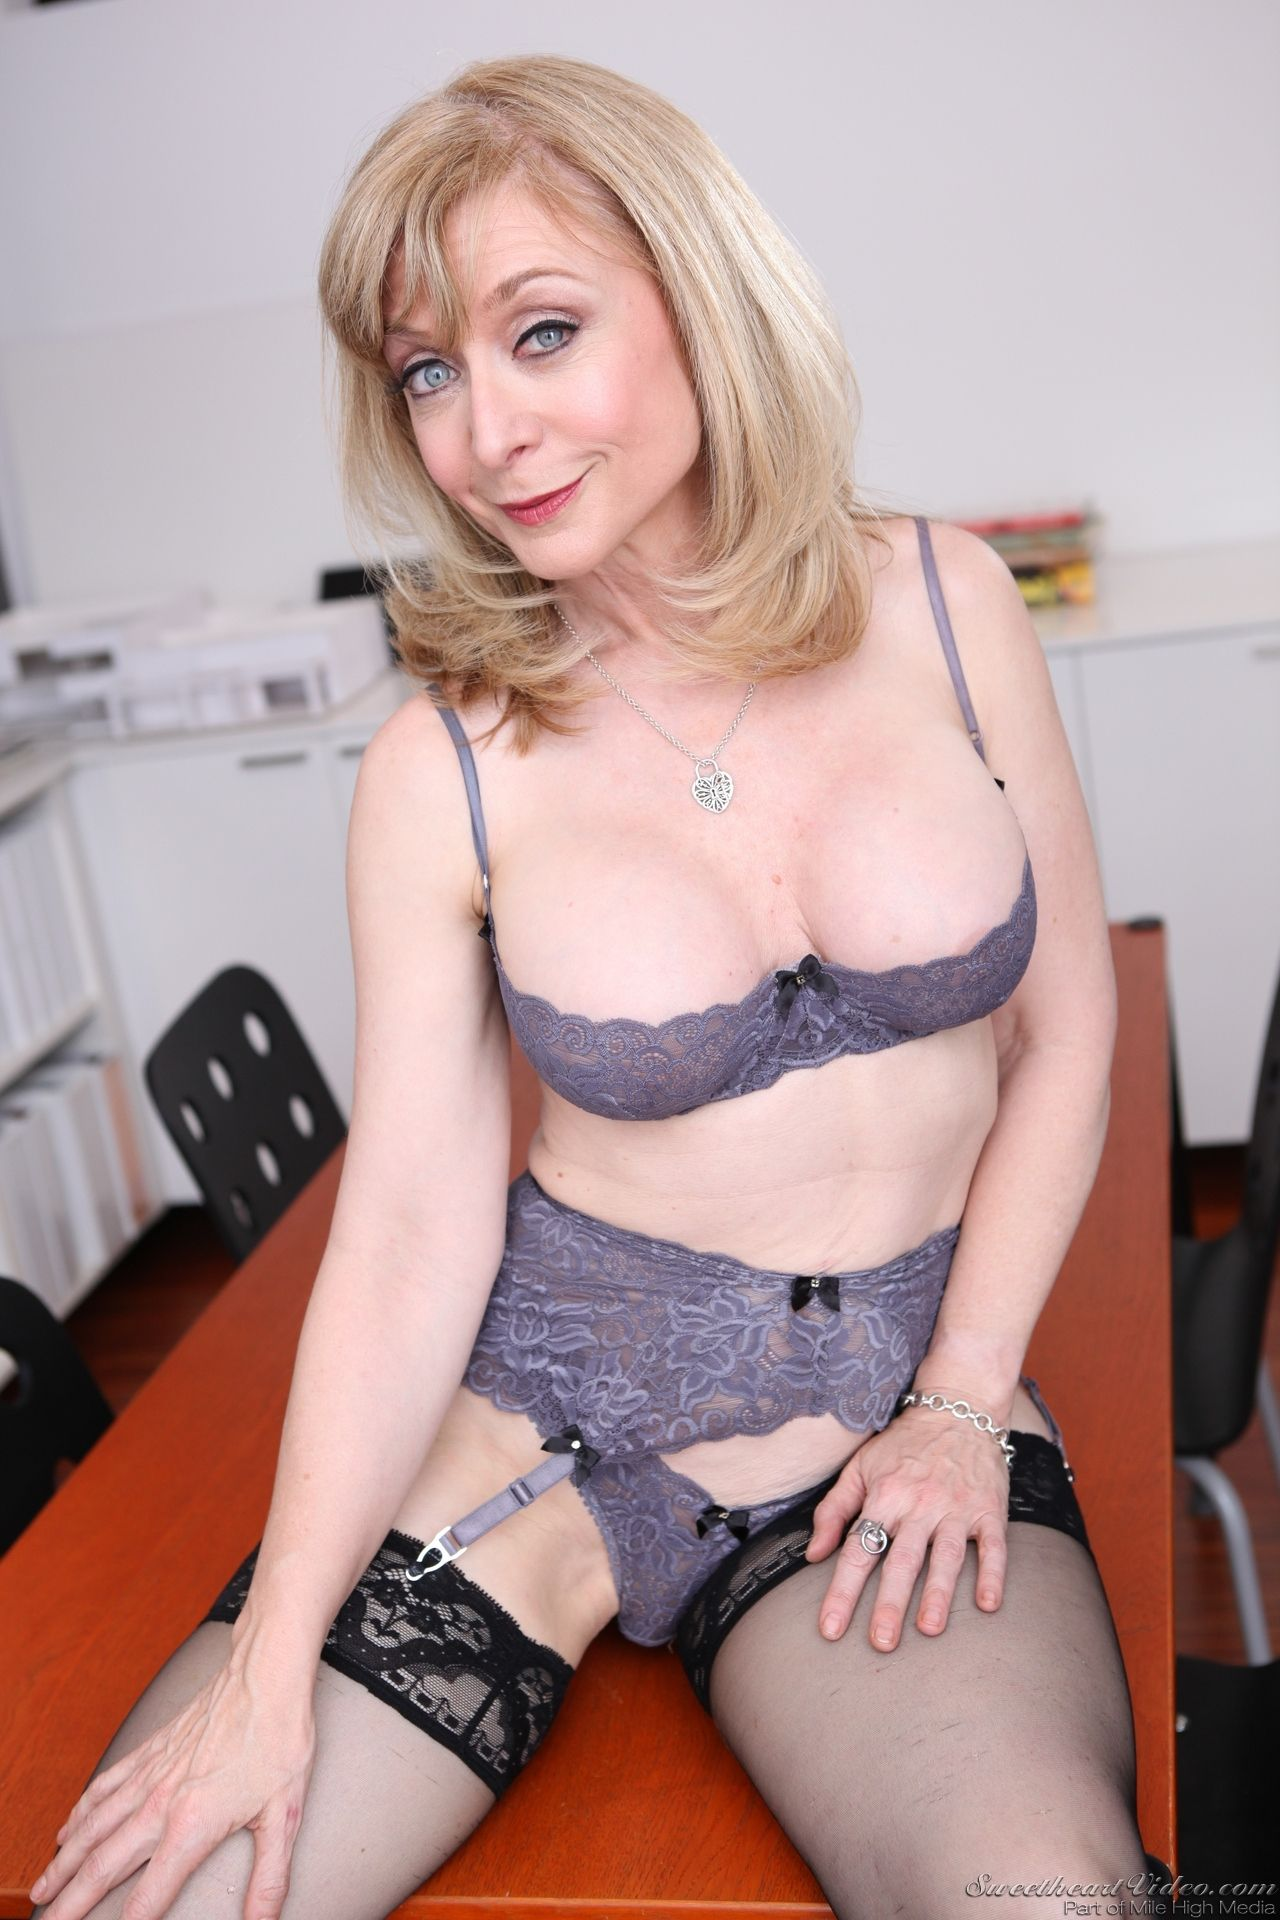 Black mikl nude woman